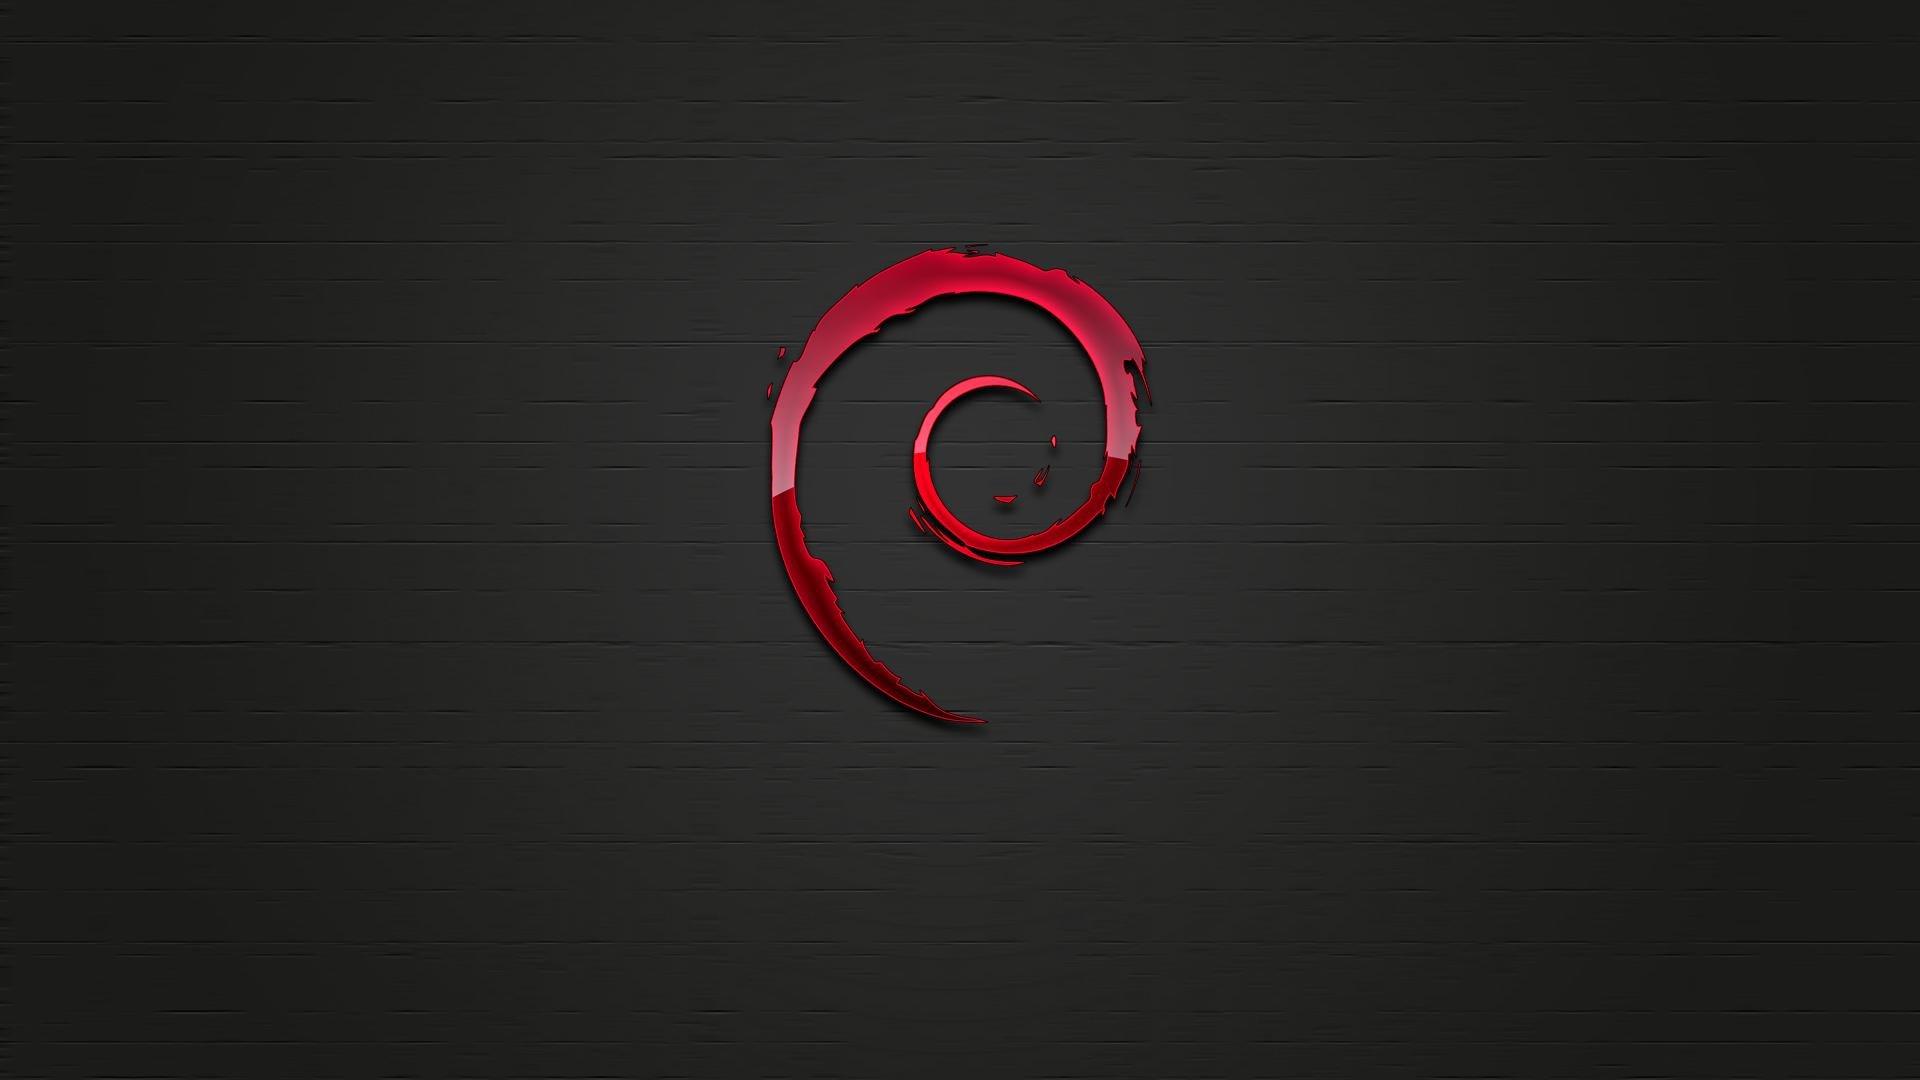 Linux Debian logo with Dark Background Wallpaper   Wallpaper Stream 1920x1080